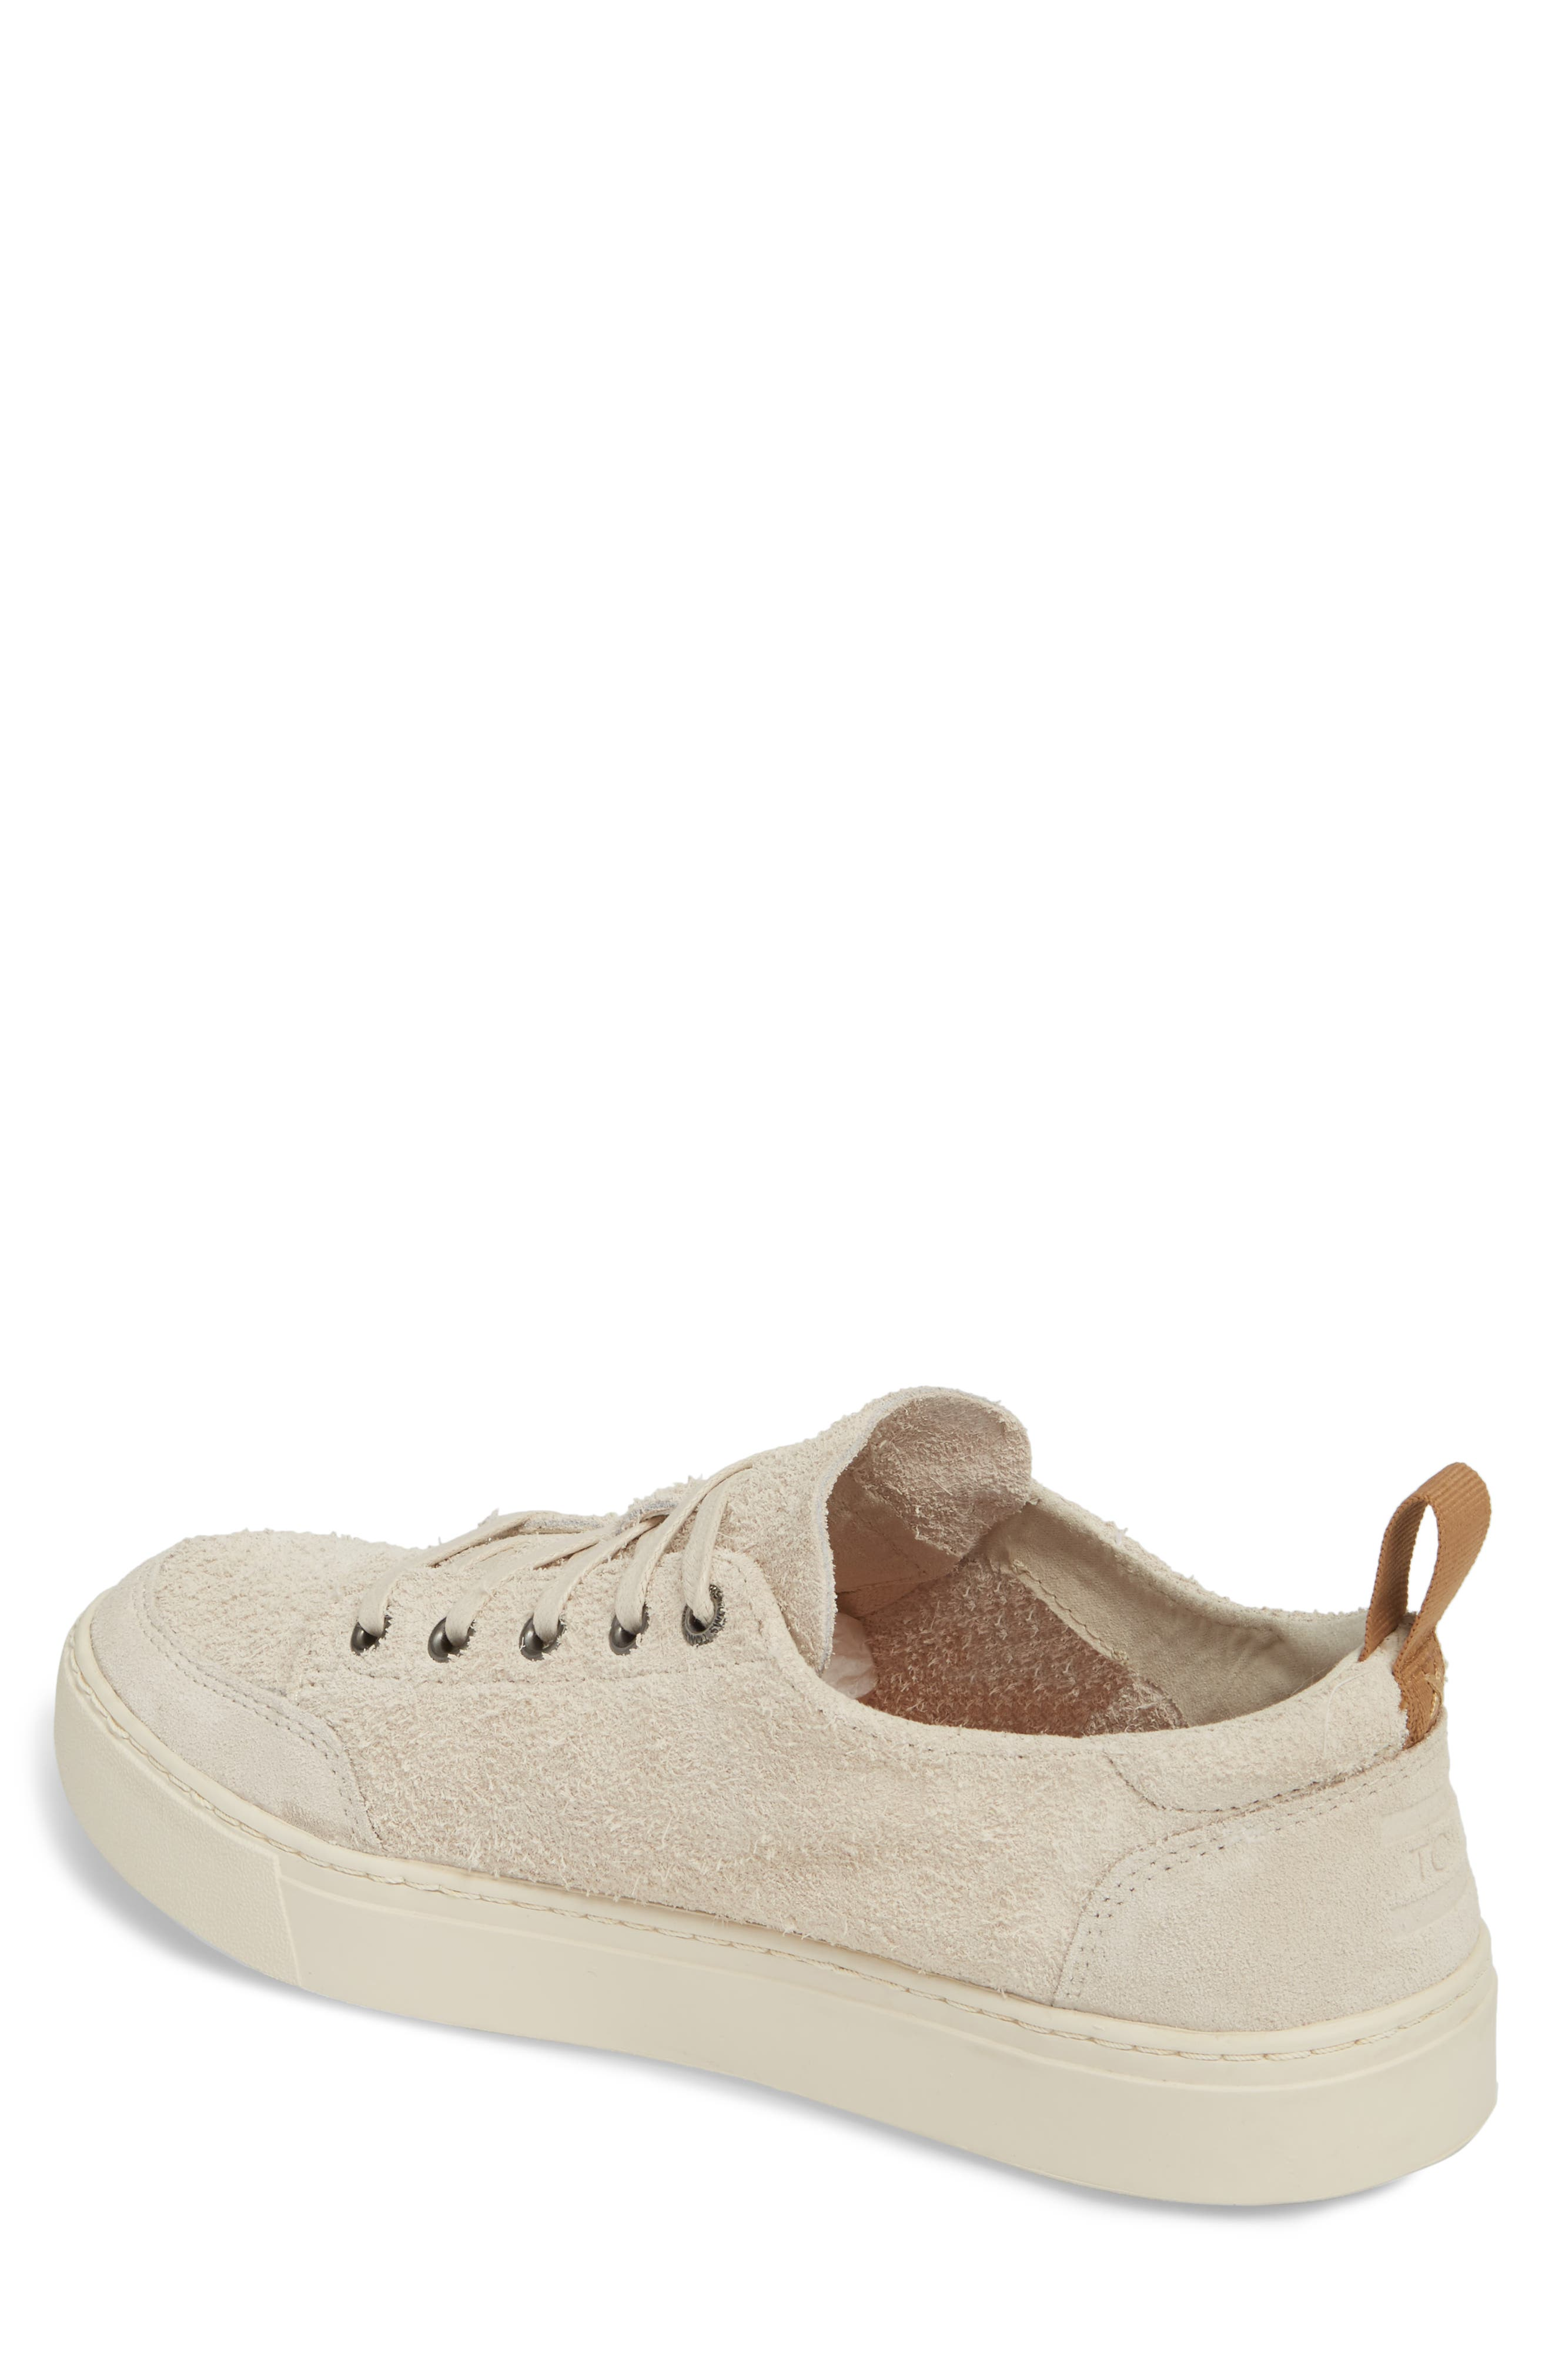 Landen Sneaker,                             Alternate thumbnail 2, color,                             BIRCH SHAGGY SUEDE